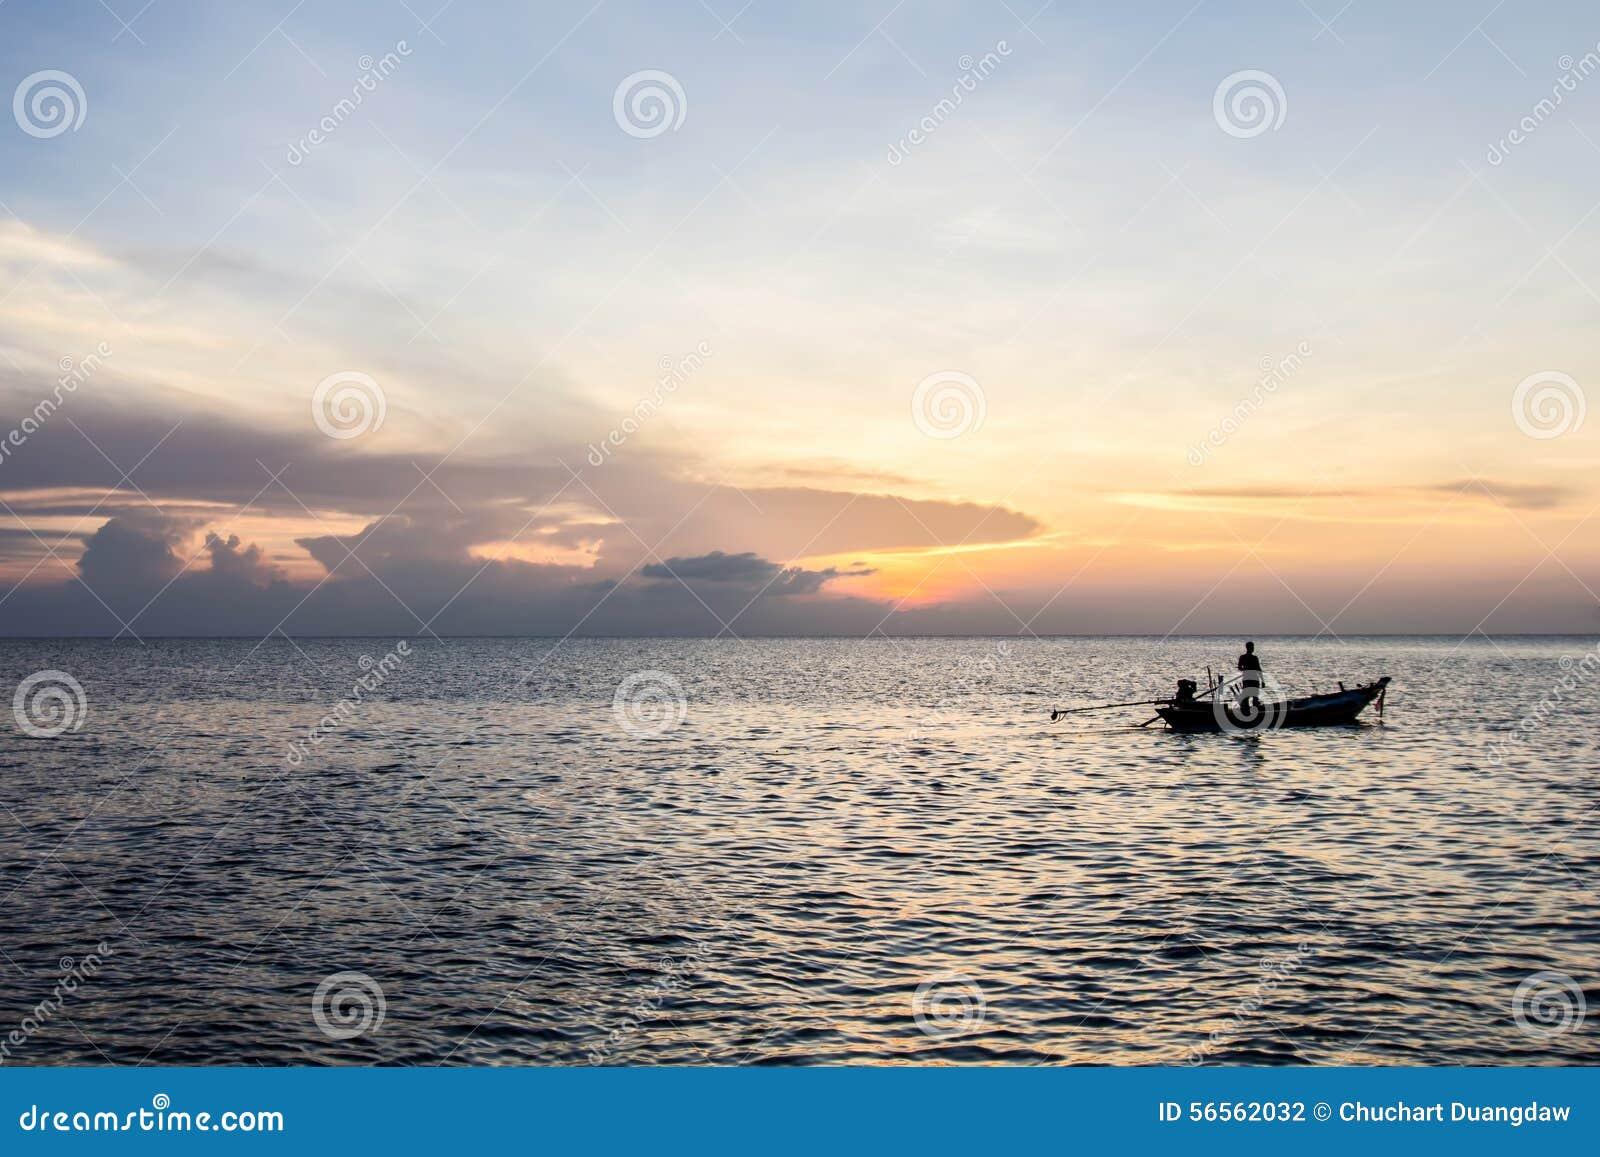 Download Με μακριά ουρά βάρκα και ηλιοβασίλεμα εν πλω, Koh Phangan, Σουράτ Thani, Tha Στοκ Εικόνες - εικόνα από φύση, παράδεισος: 56562032